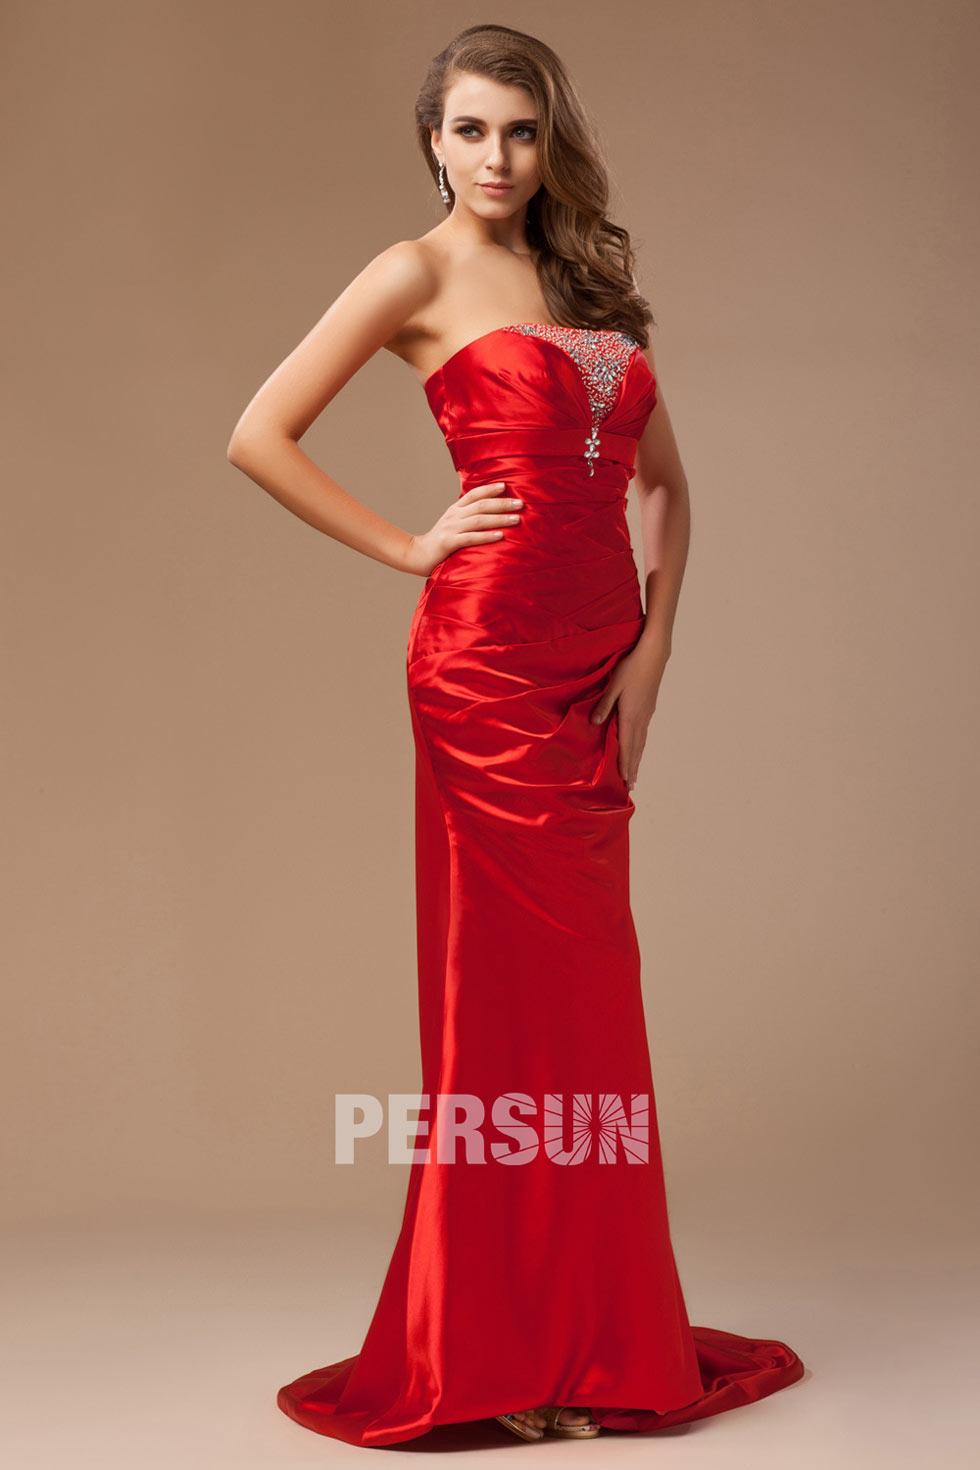 Gala de la robe rouge sherbrooke